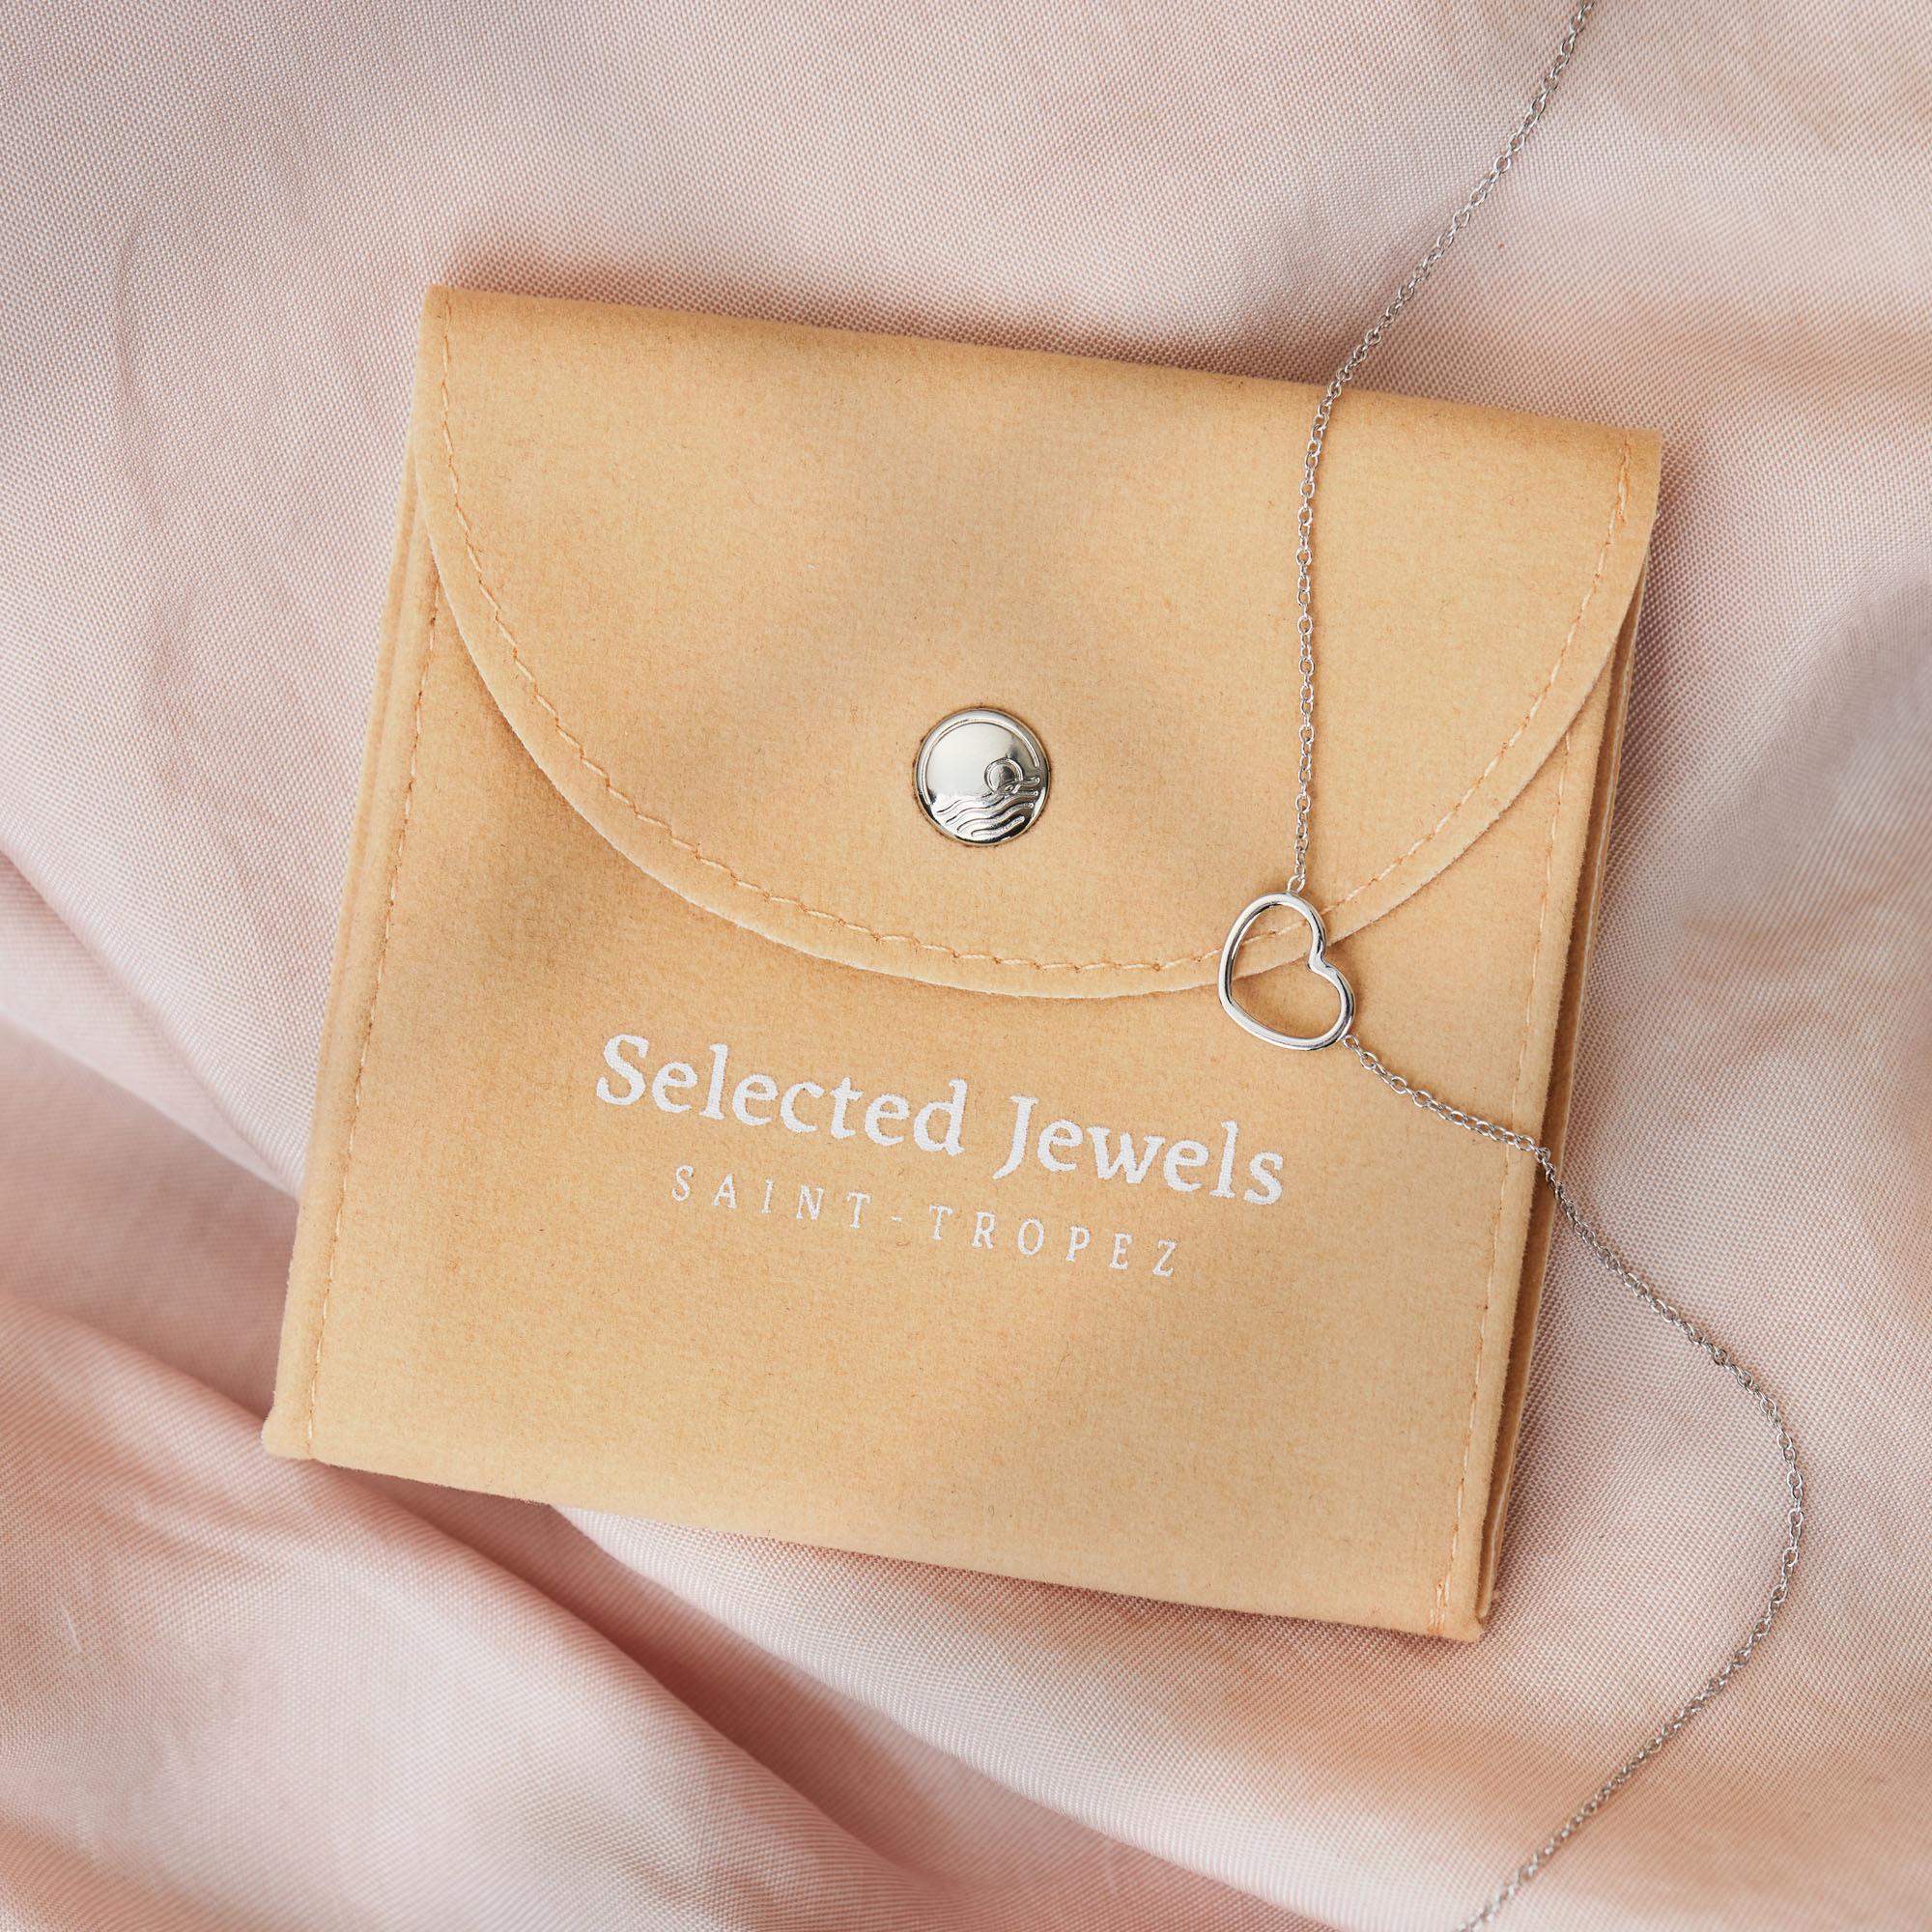 Selected Jewels Mila Elodie créoles en argent sterling 925